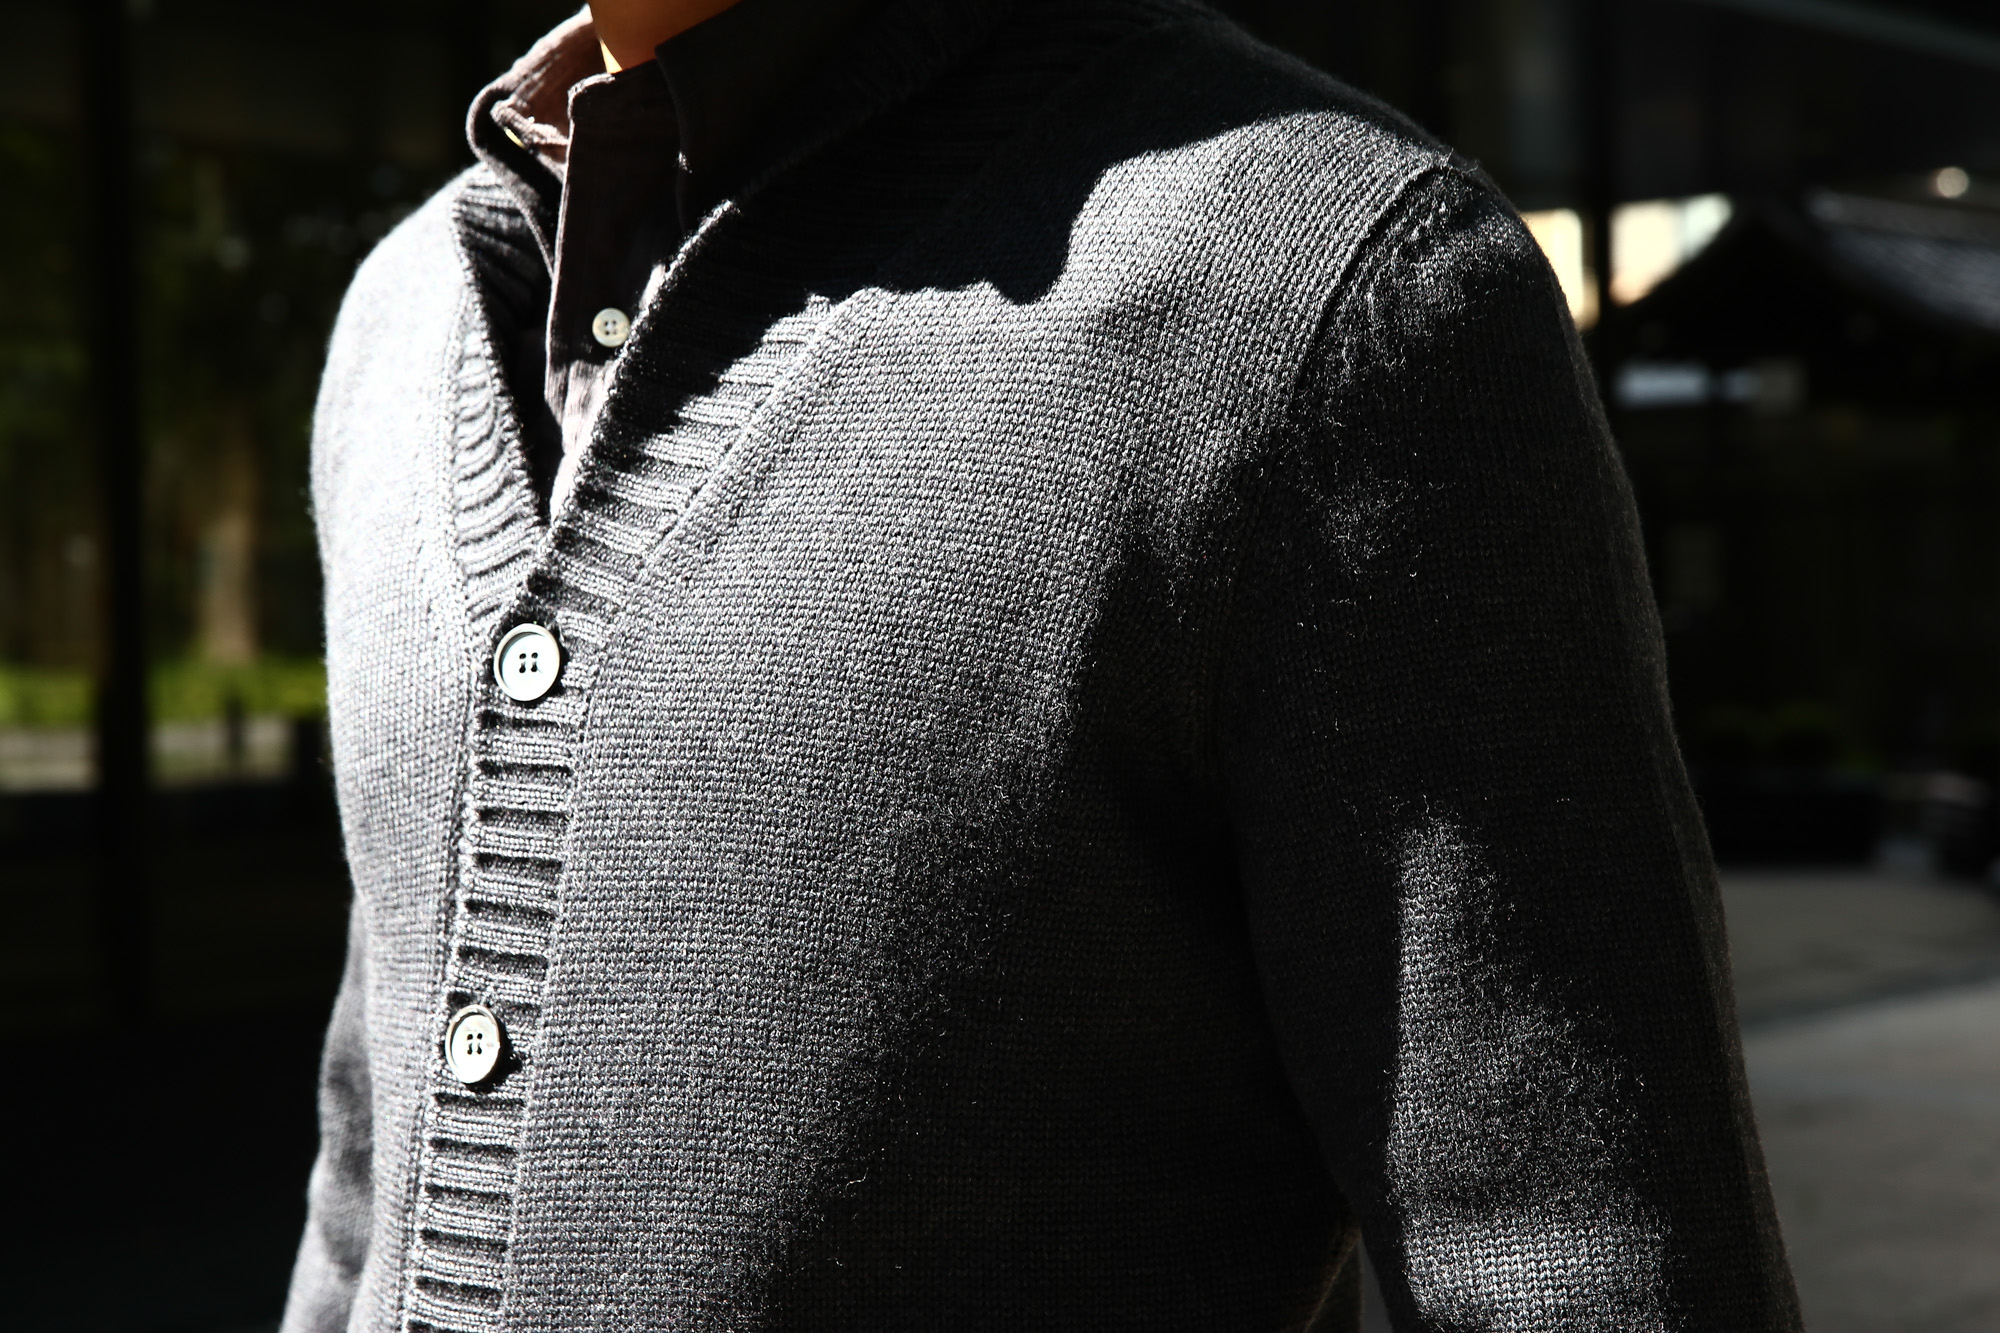 ZANONE (ザノーネ) Shawl Collar Cardigan 811947 Z0229 VIRGIN WOOL 100% ミドルゲージニット ショールカラーカーディガン CHARCOAL (チャコール・Z0006) MADE IN ITALY 2016 秋冬 ZODIAC 愛知 名古屋 ザノーネ